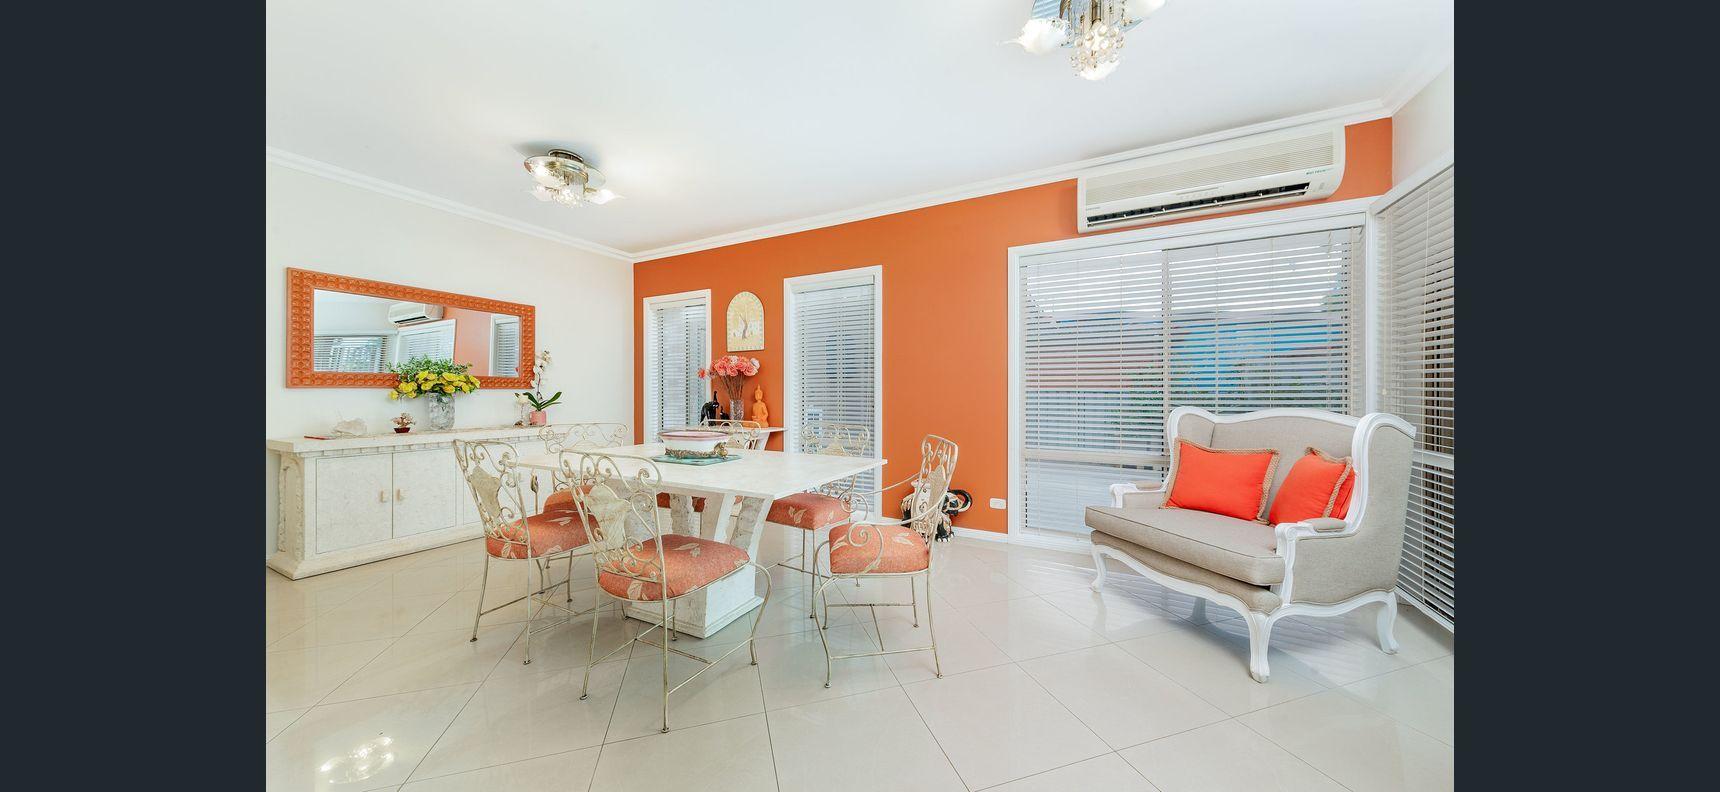 7 Wilson Avenue, Winston Hills NSW 2153